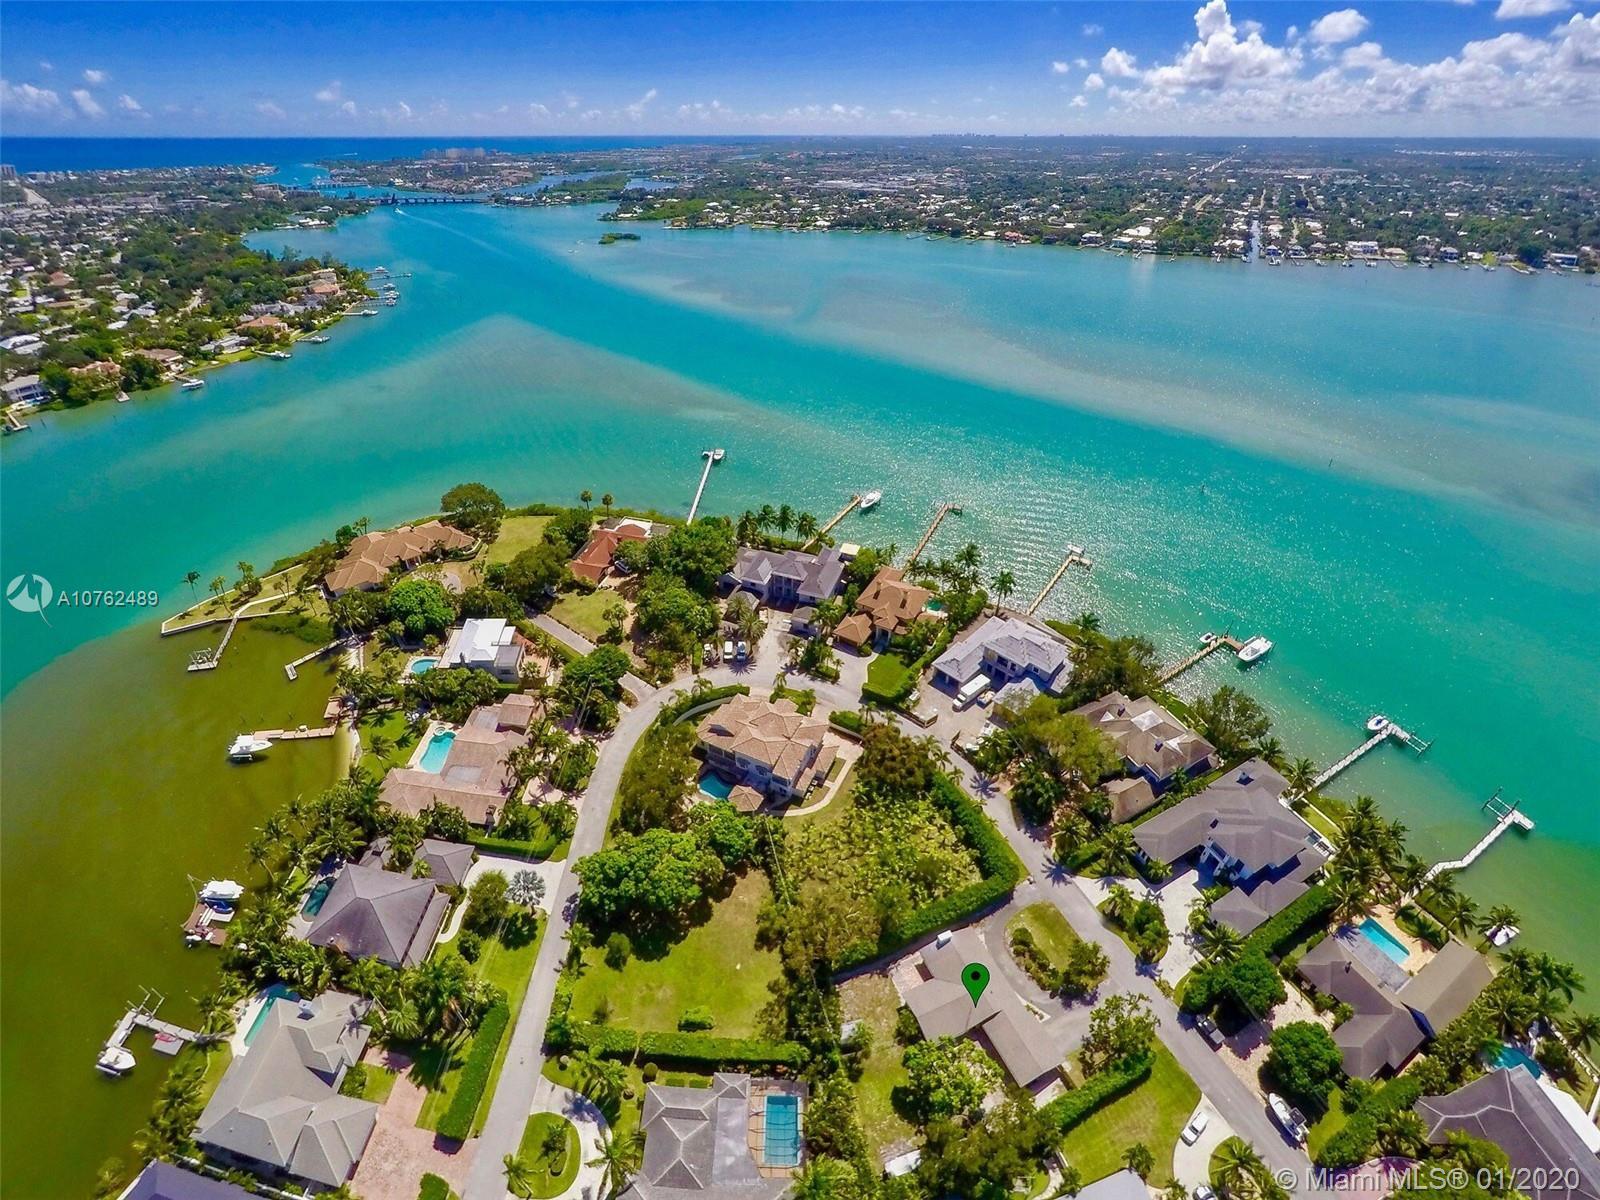 18730 Rio Vista Dr, Unincorporated Palm Beach County, FL 33469